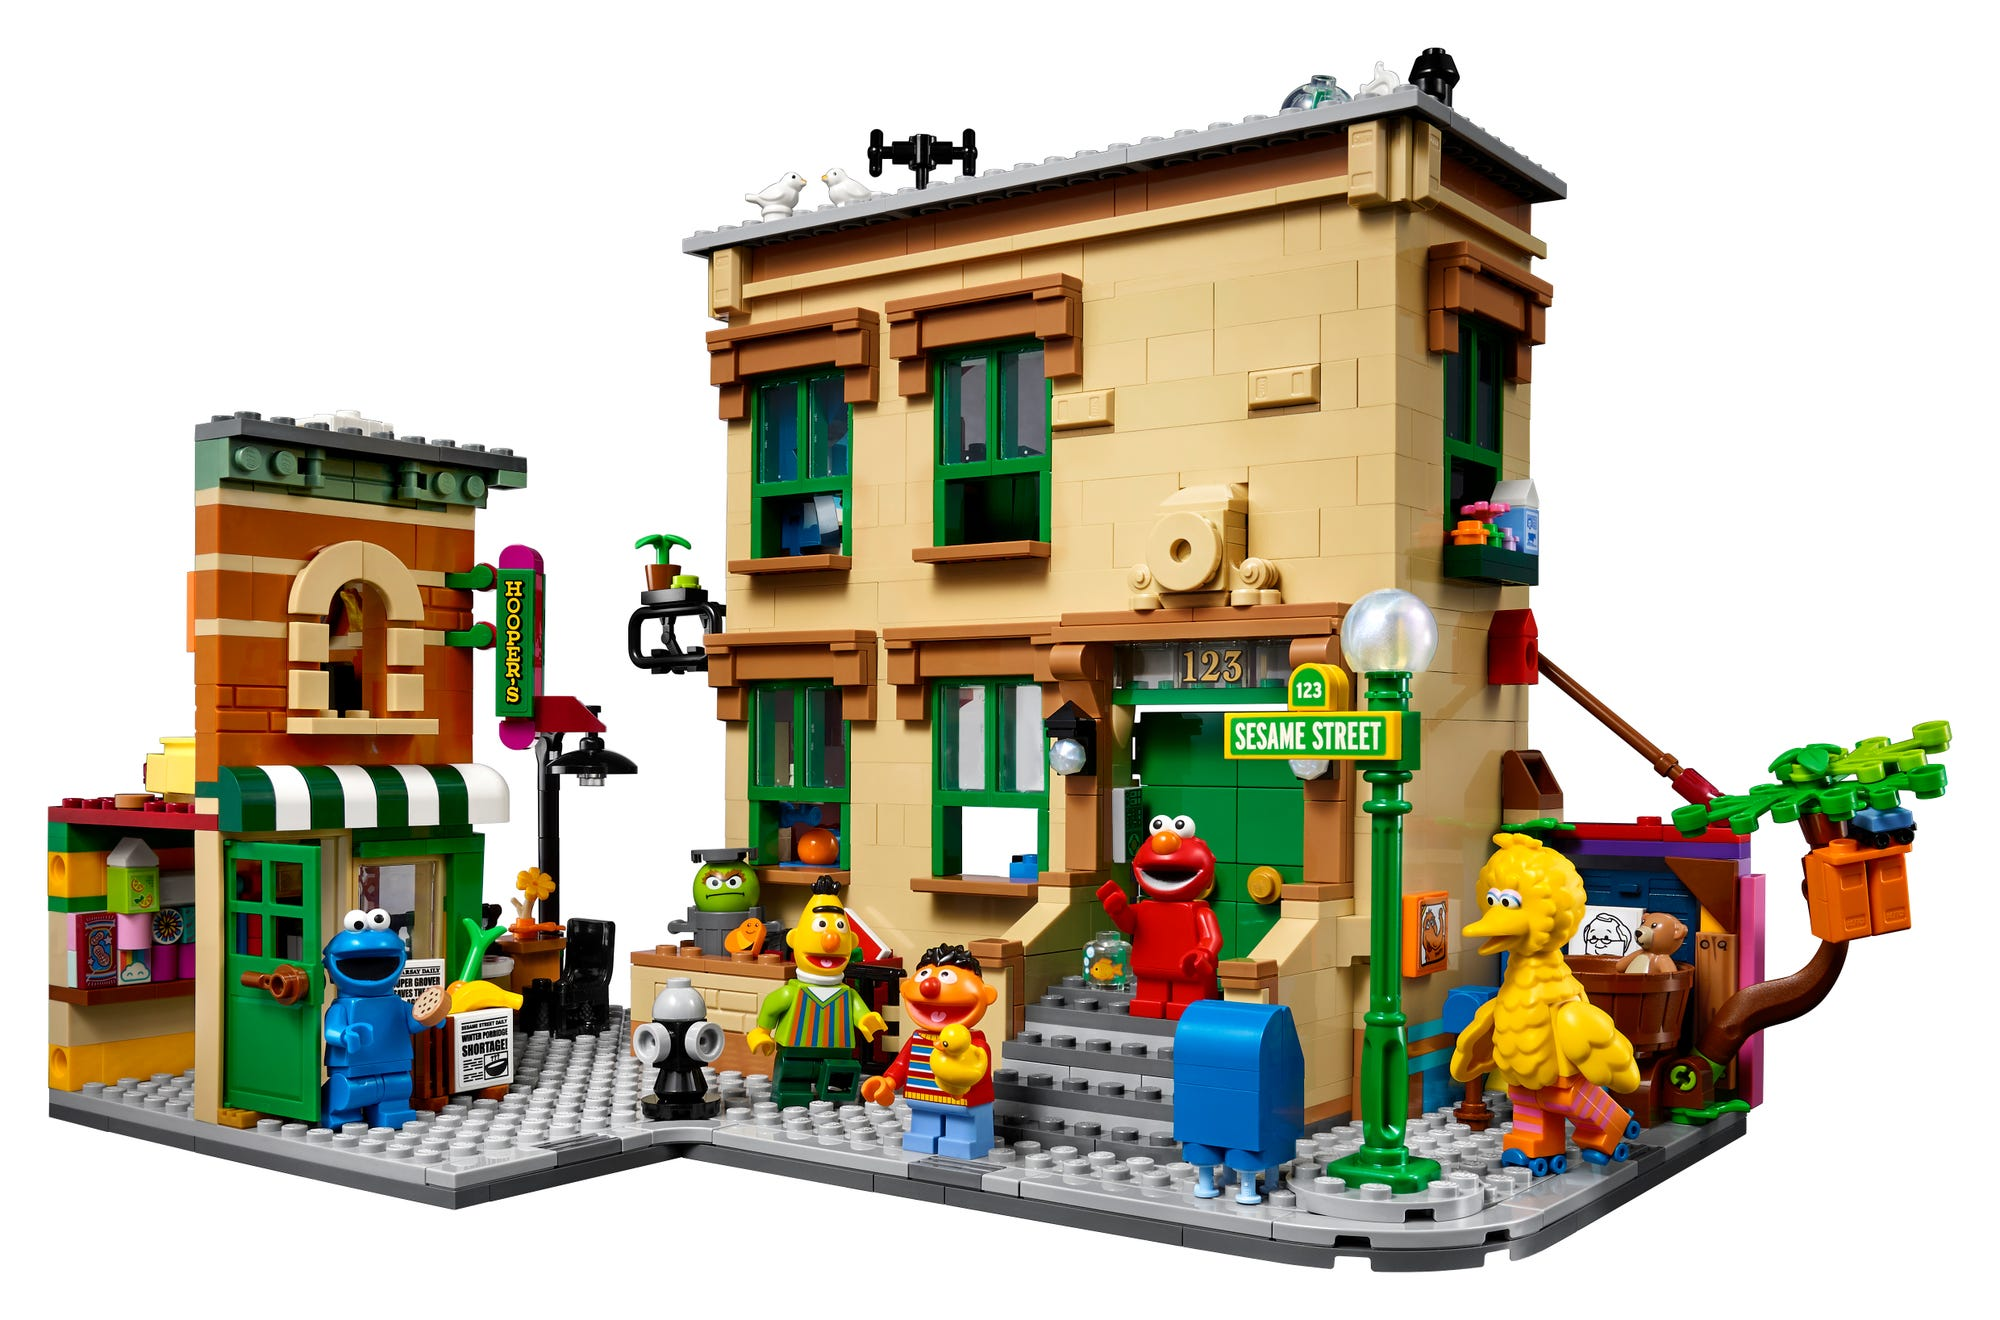 LEGO Ideas 21324 Sesame Street (3)